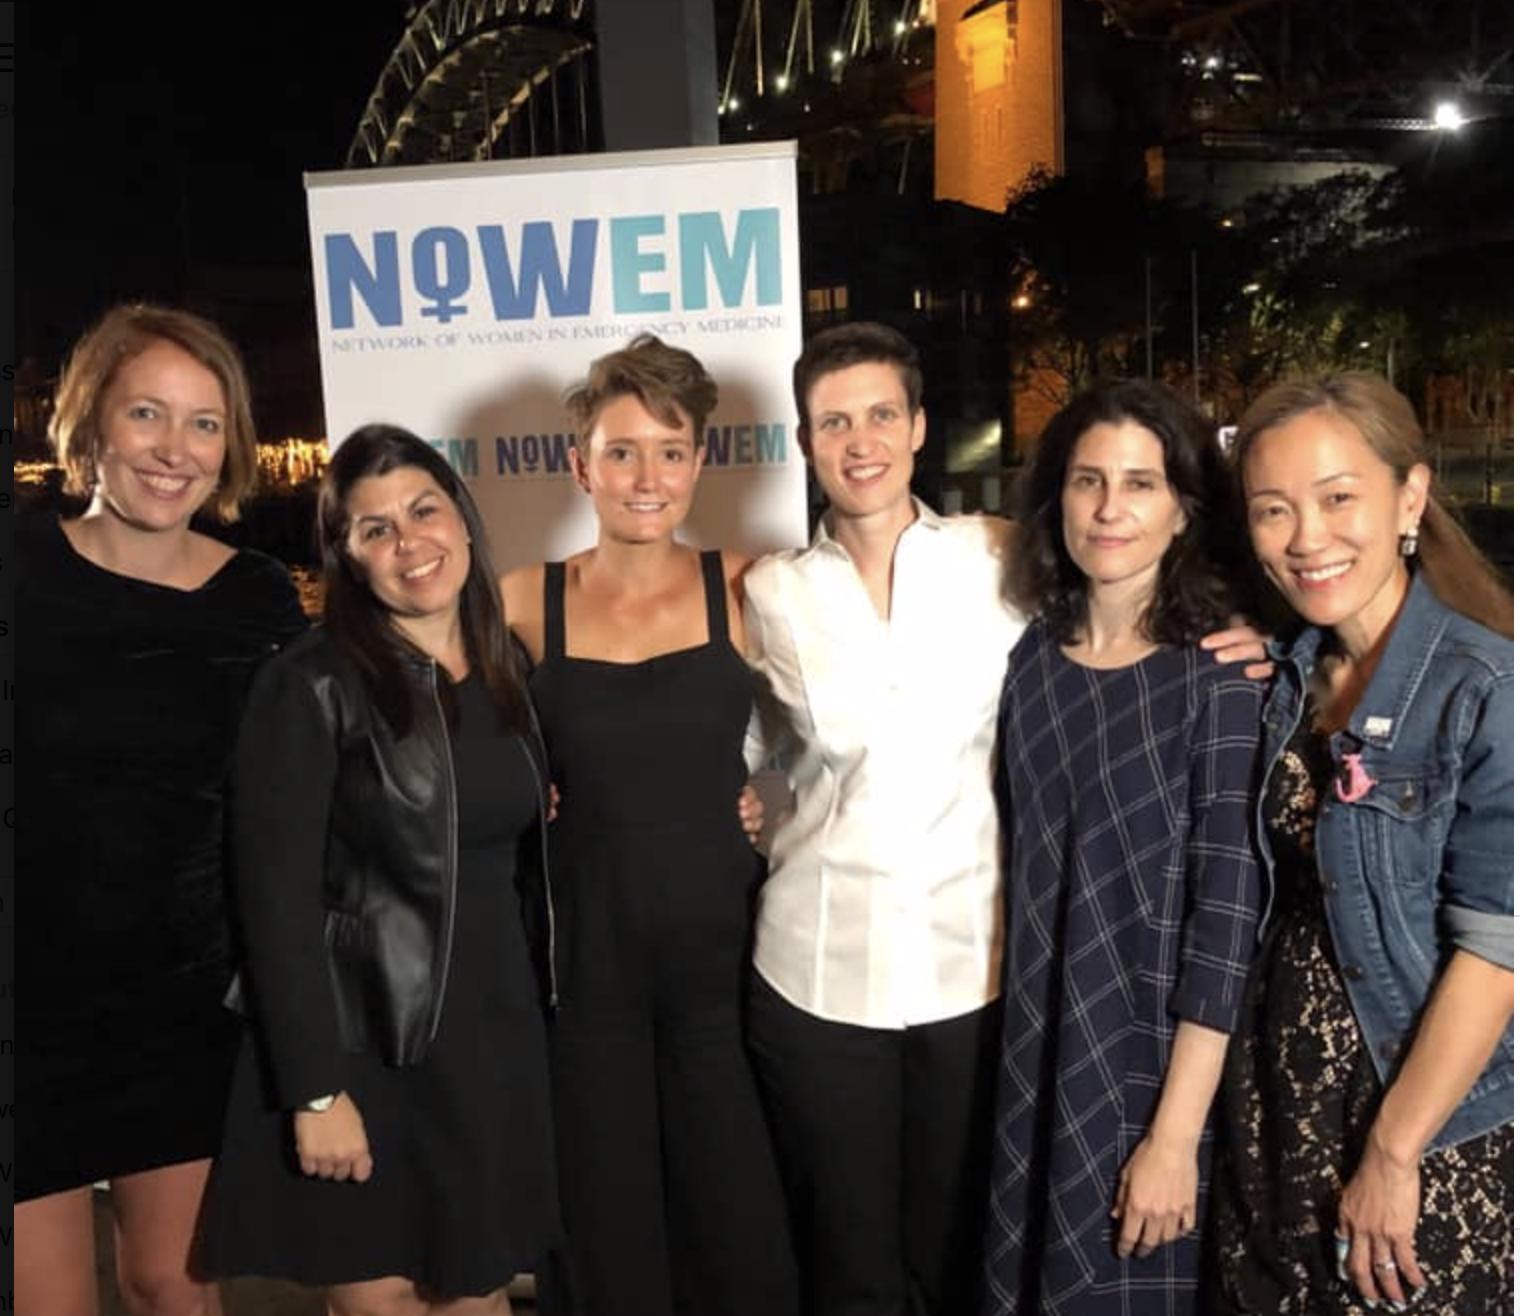 NoWEM x FemInEM - 26th March 2019